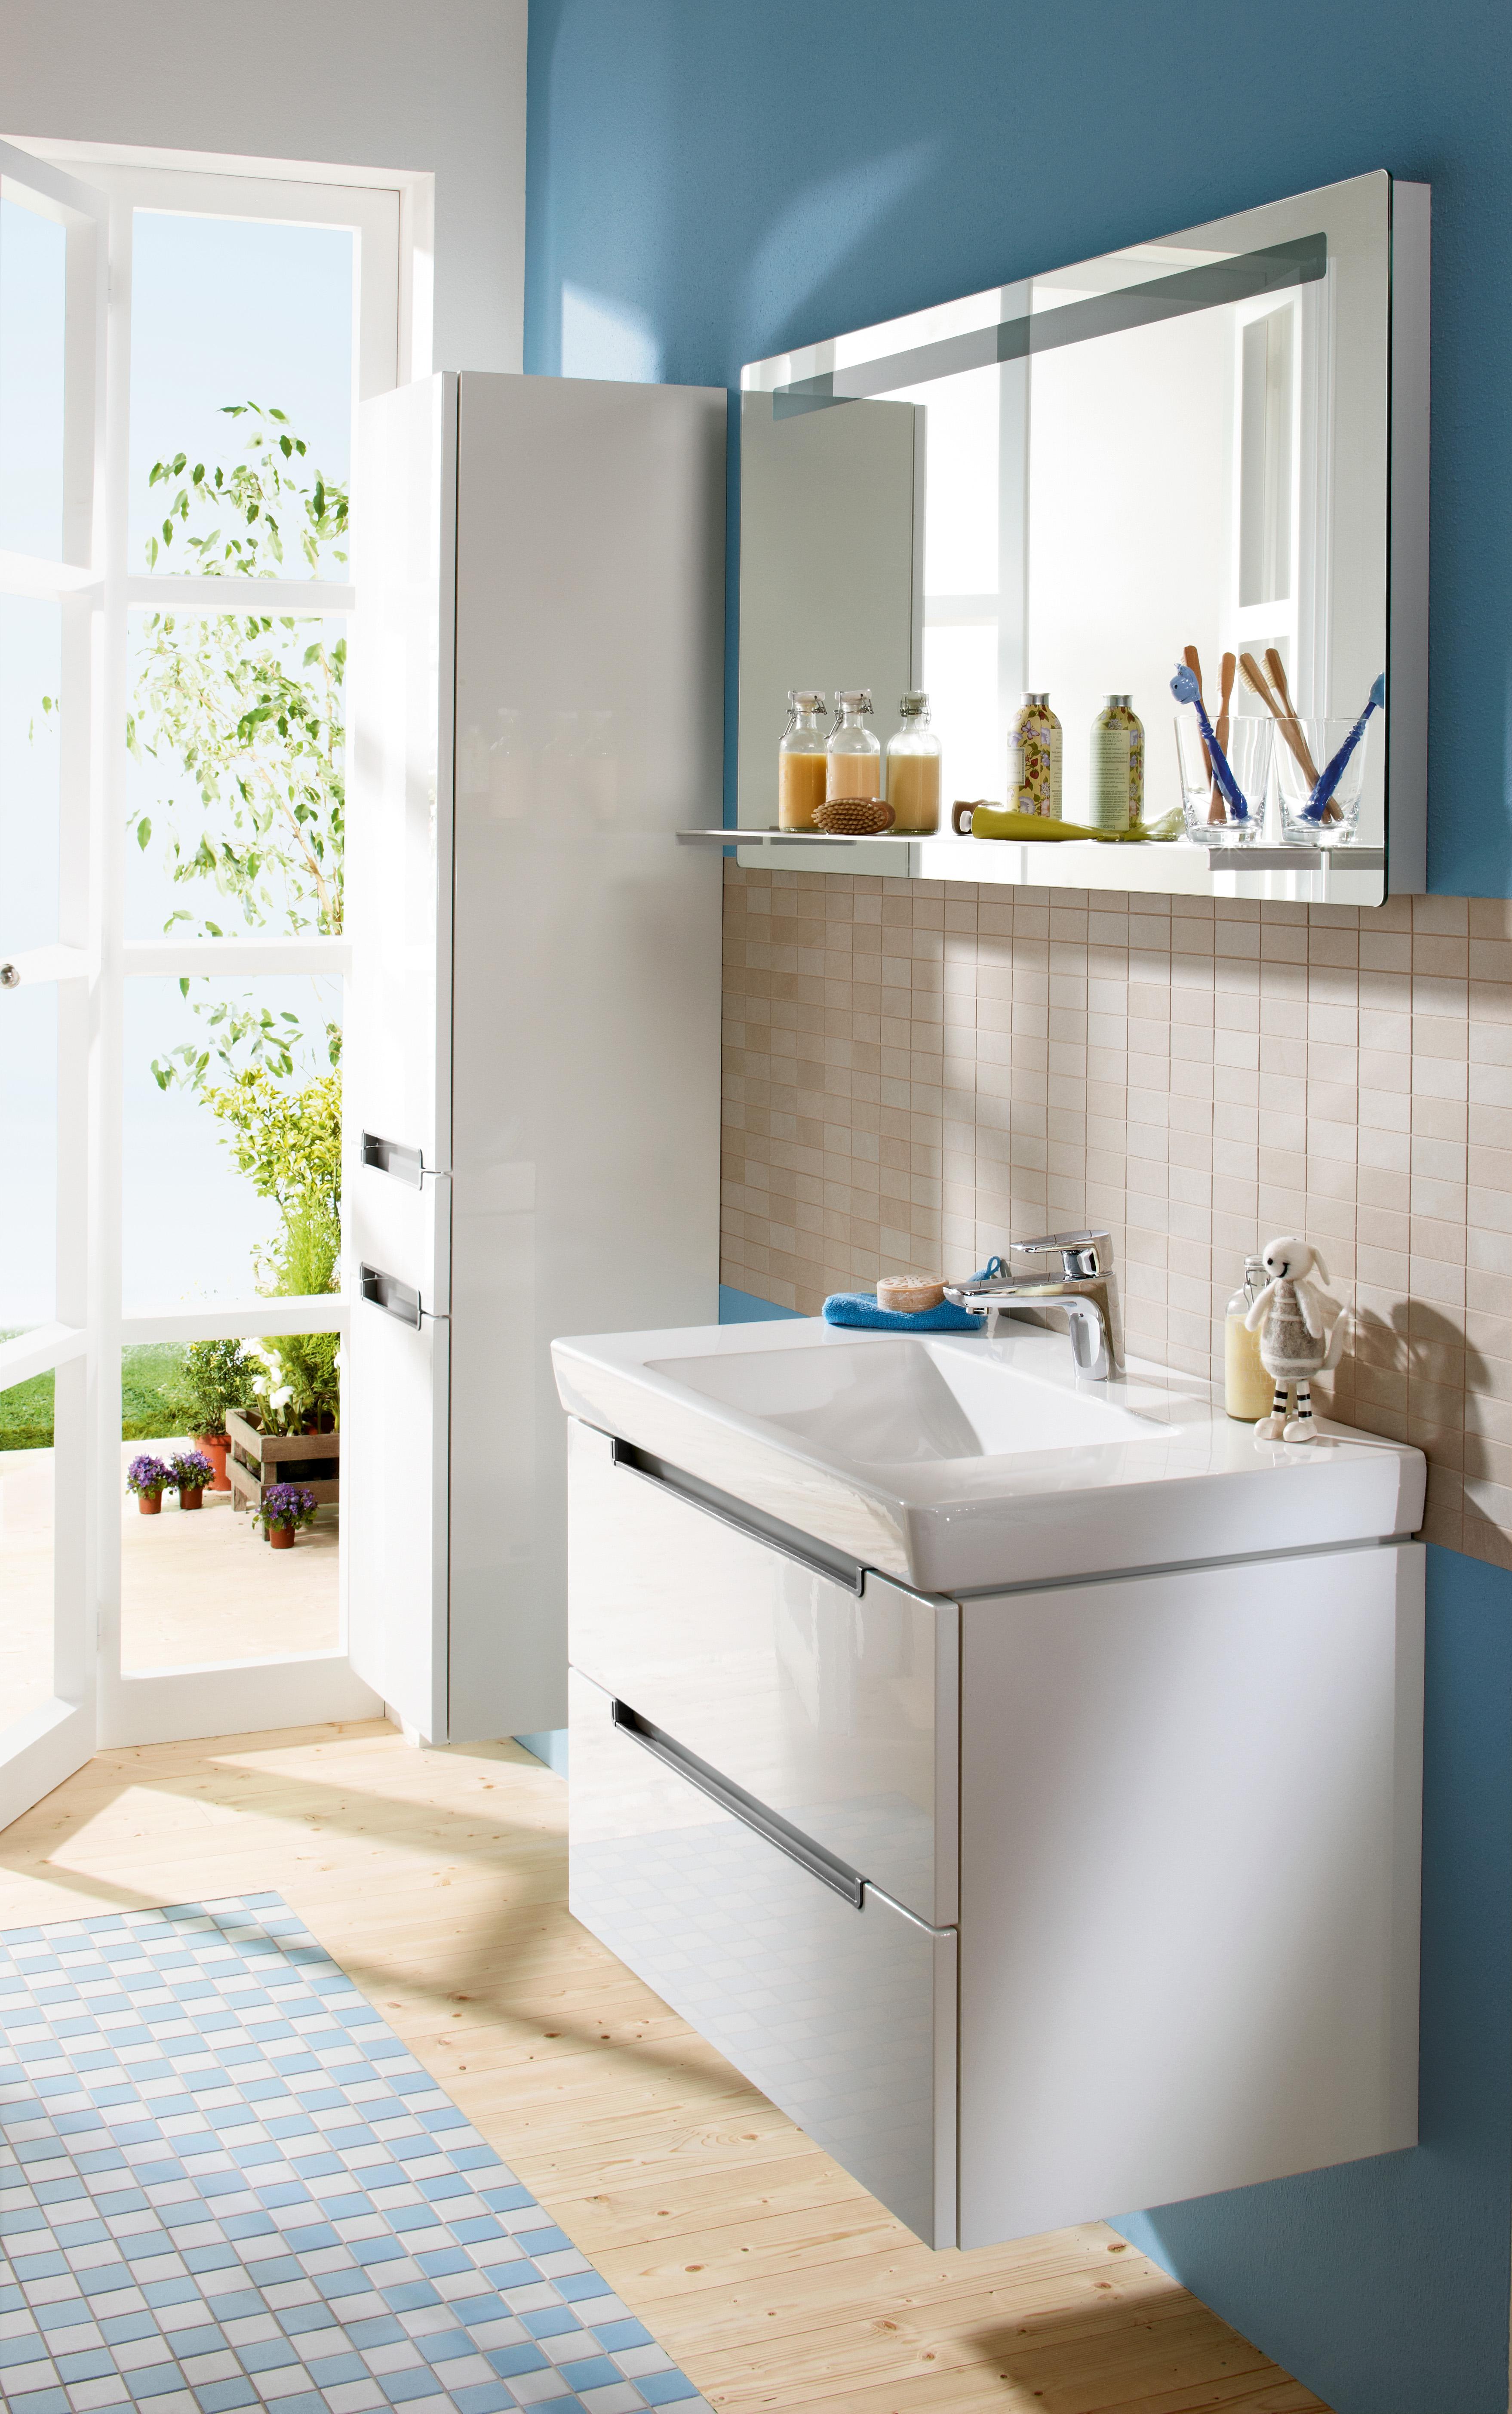 Subway 2.0 Bathroom furniture, Vanity unit for washbasin, Bathroom sink cabinets